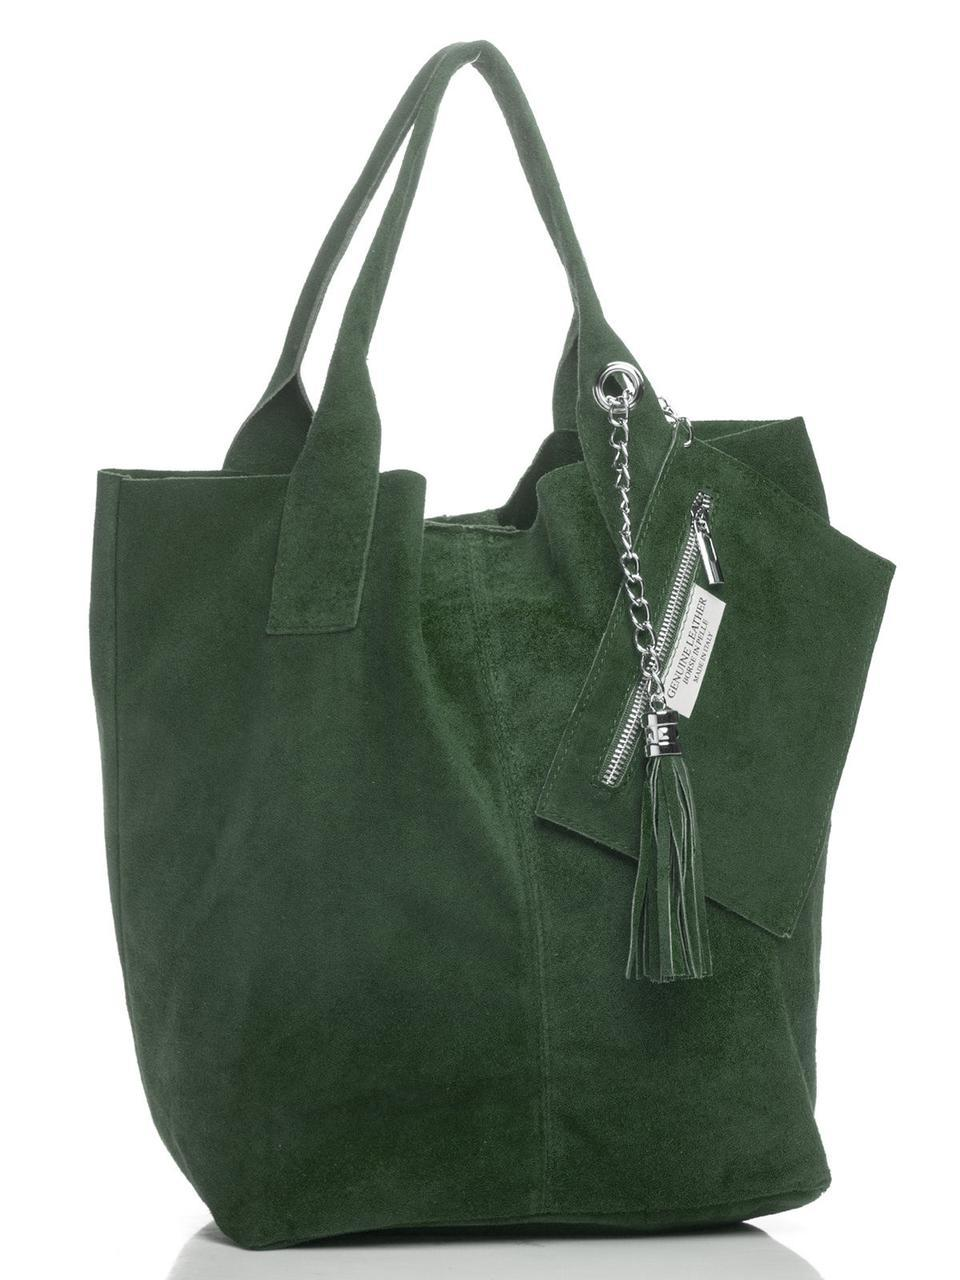 Cумка-шопер ARIANNA женская Diva's Bag темно-зеленая 27 см х 36 см х 18 см